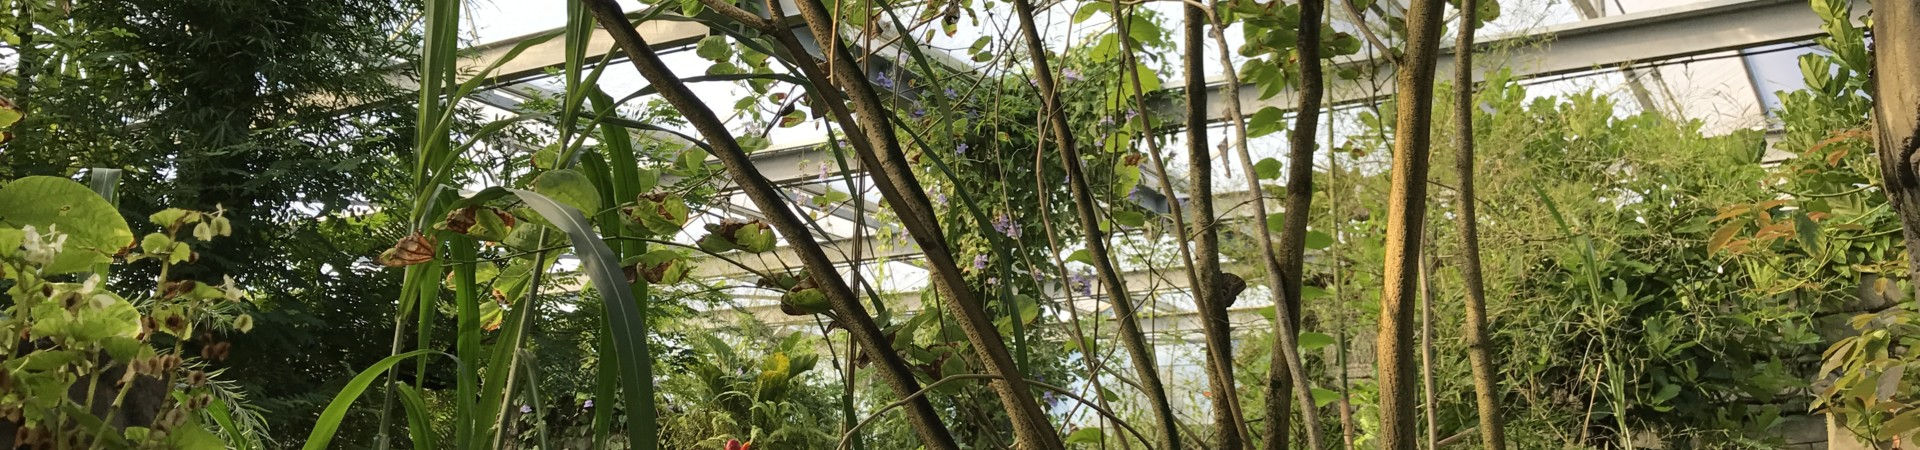 Botanical garden design - Green Conceptors